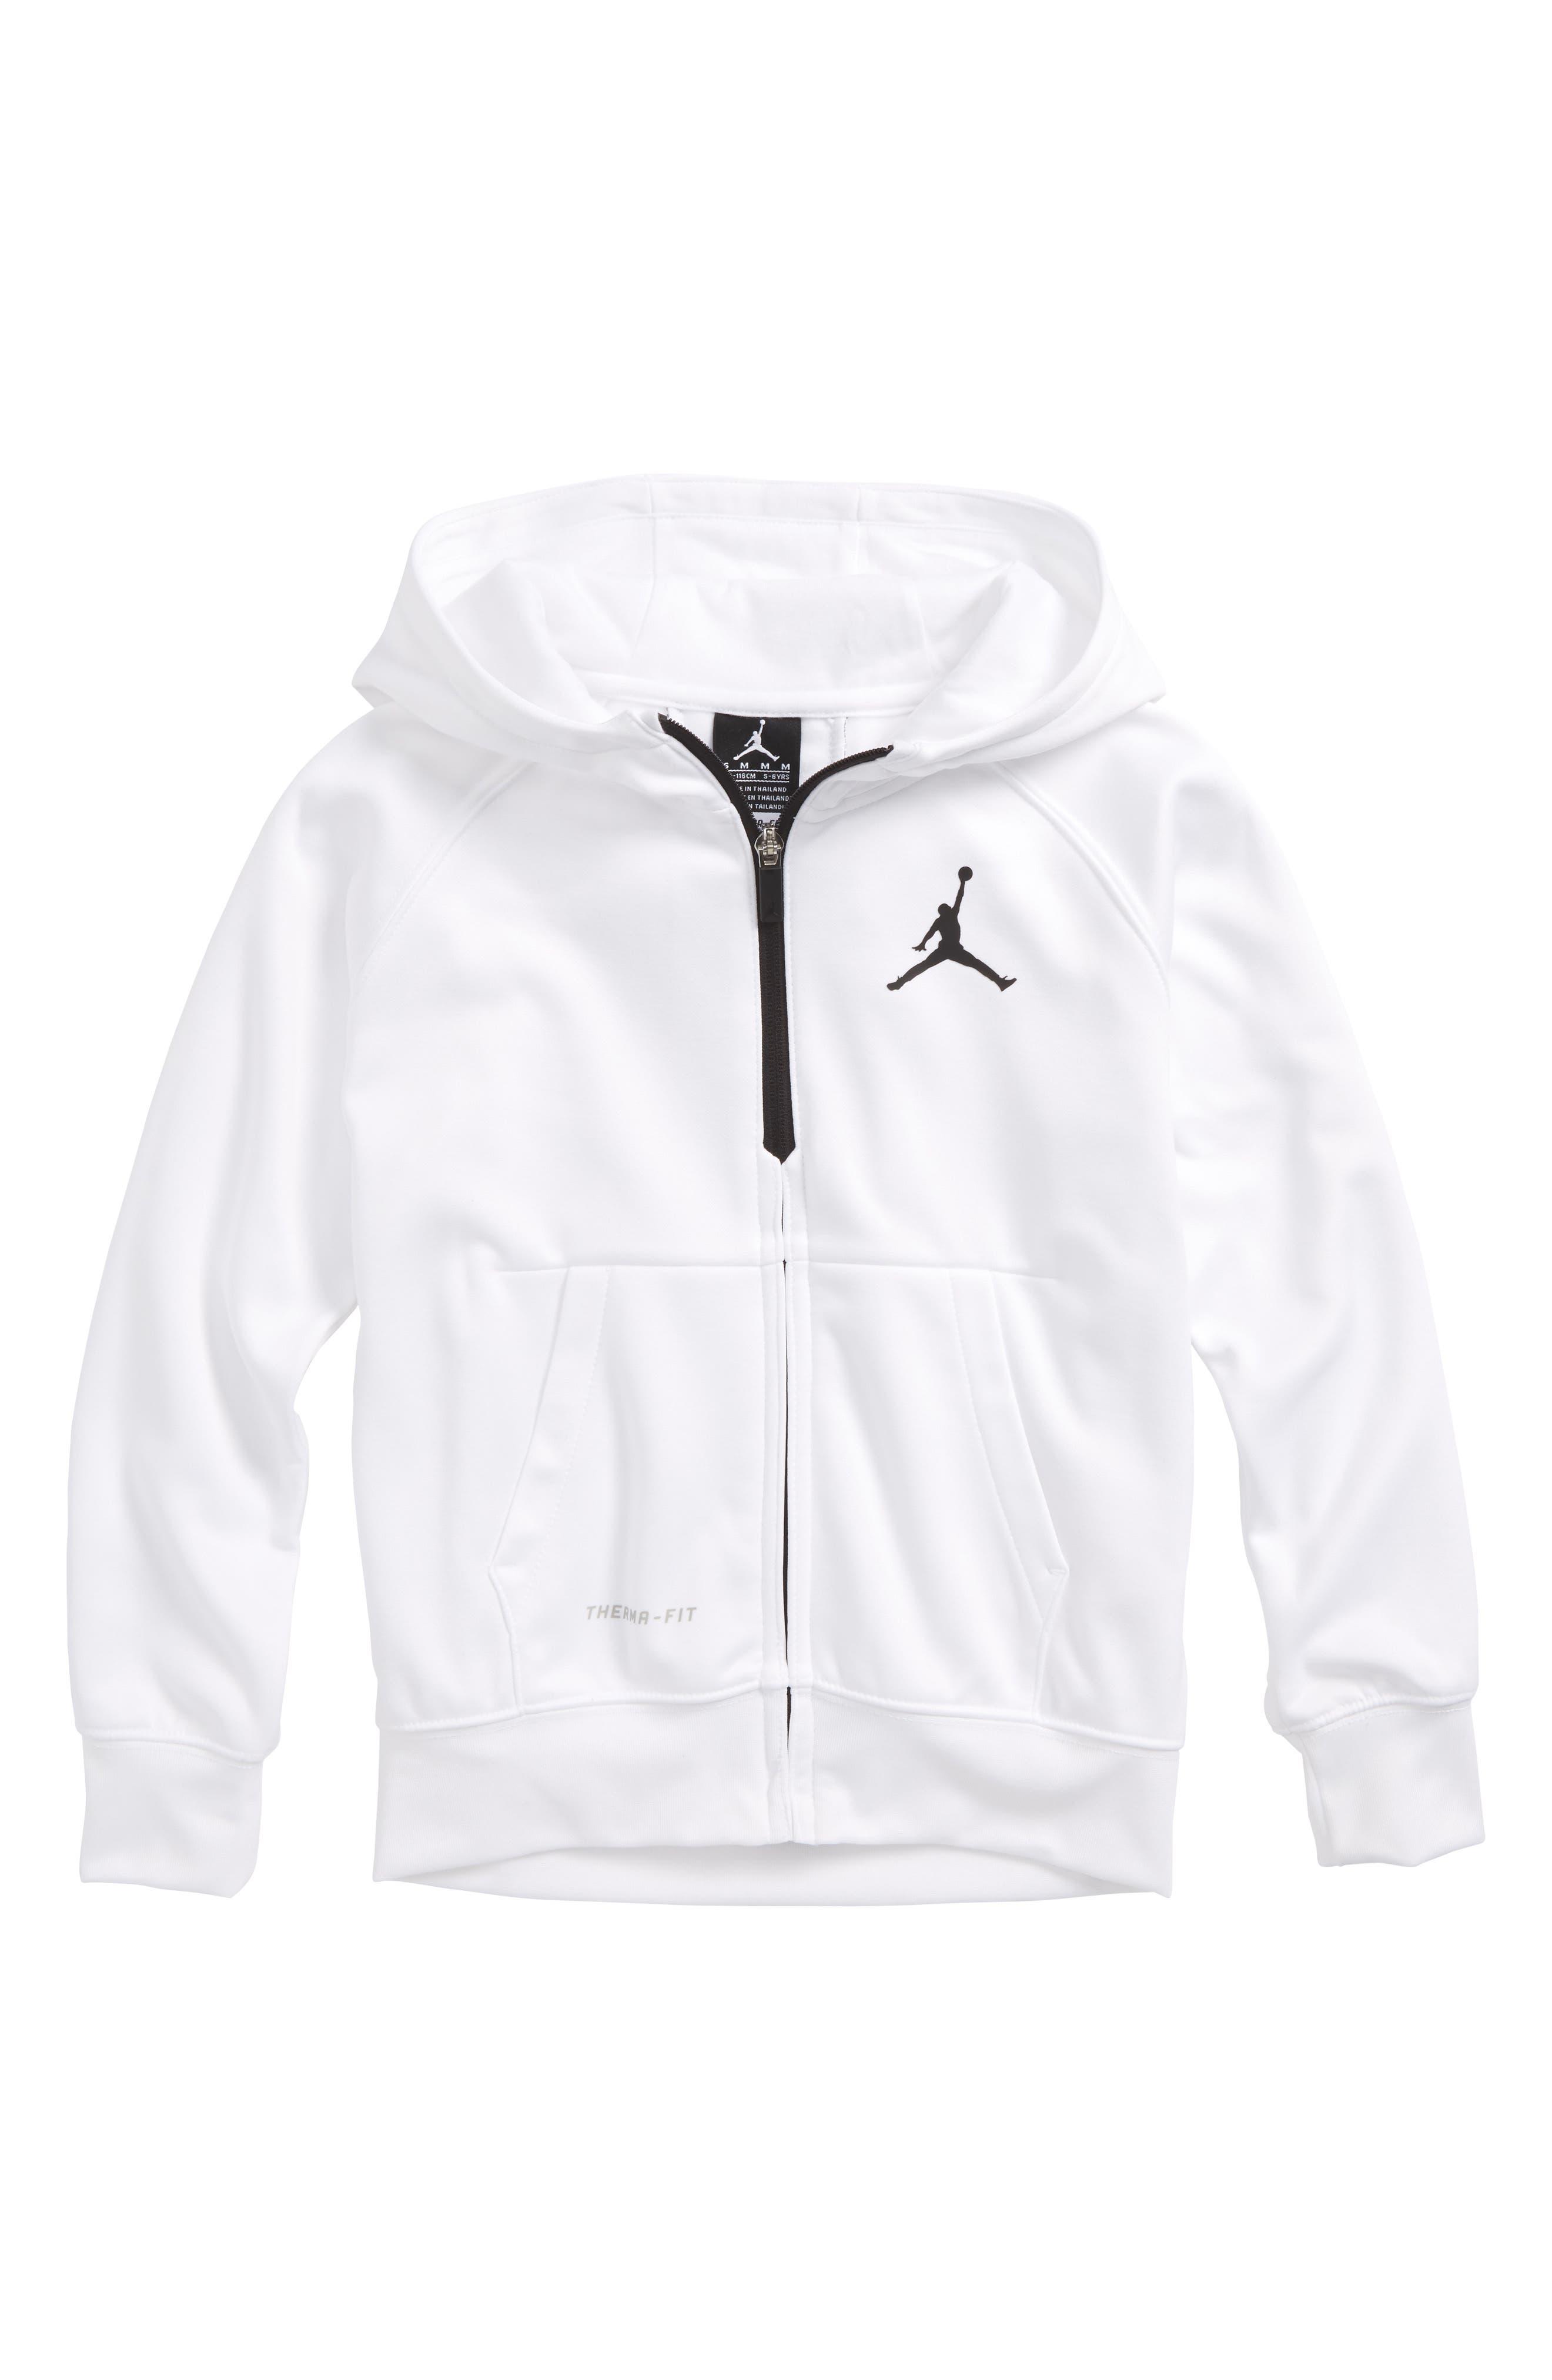 Jordan Dry 23 Alpha FZ Therma-FIT Zip Hoodie,                         Main,                         color, White